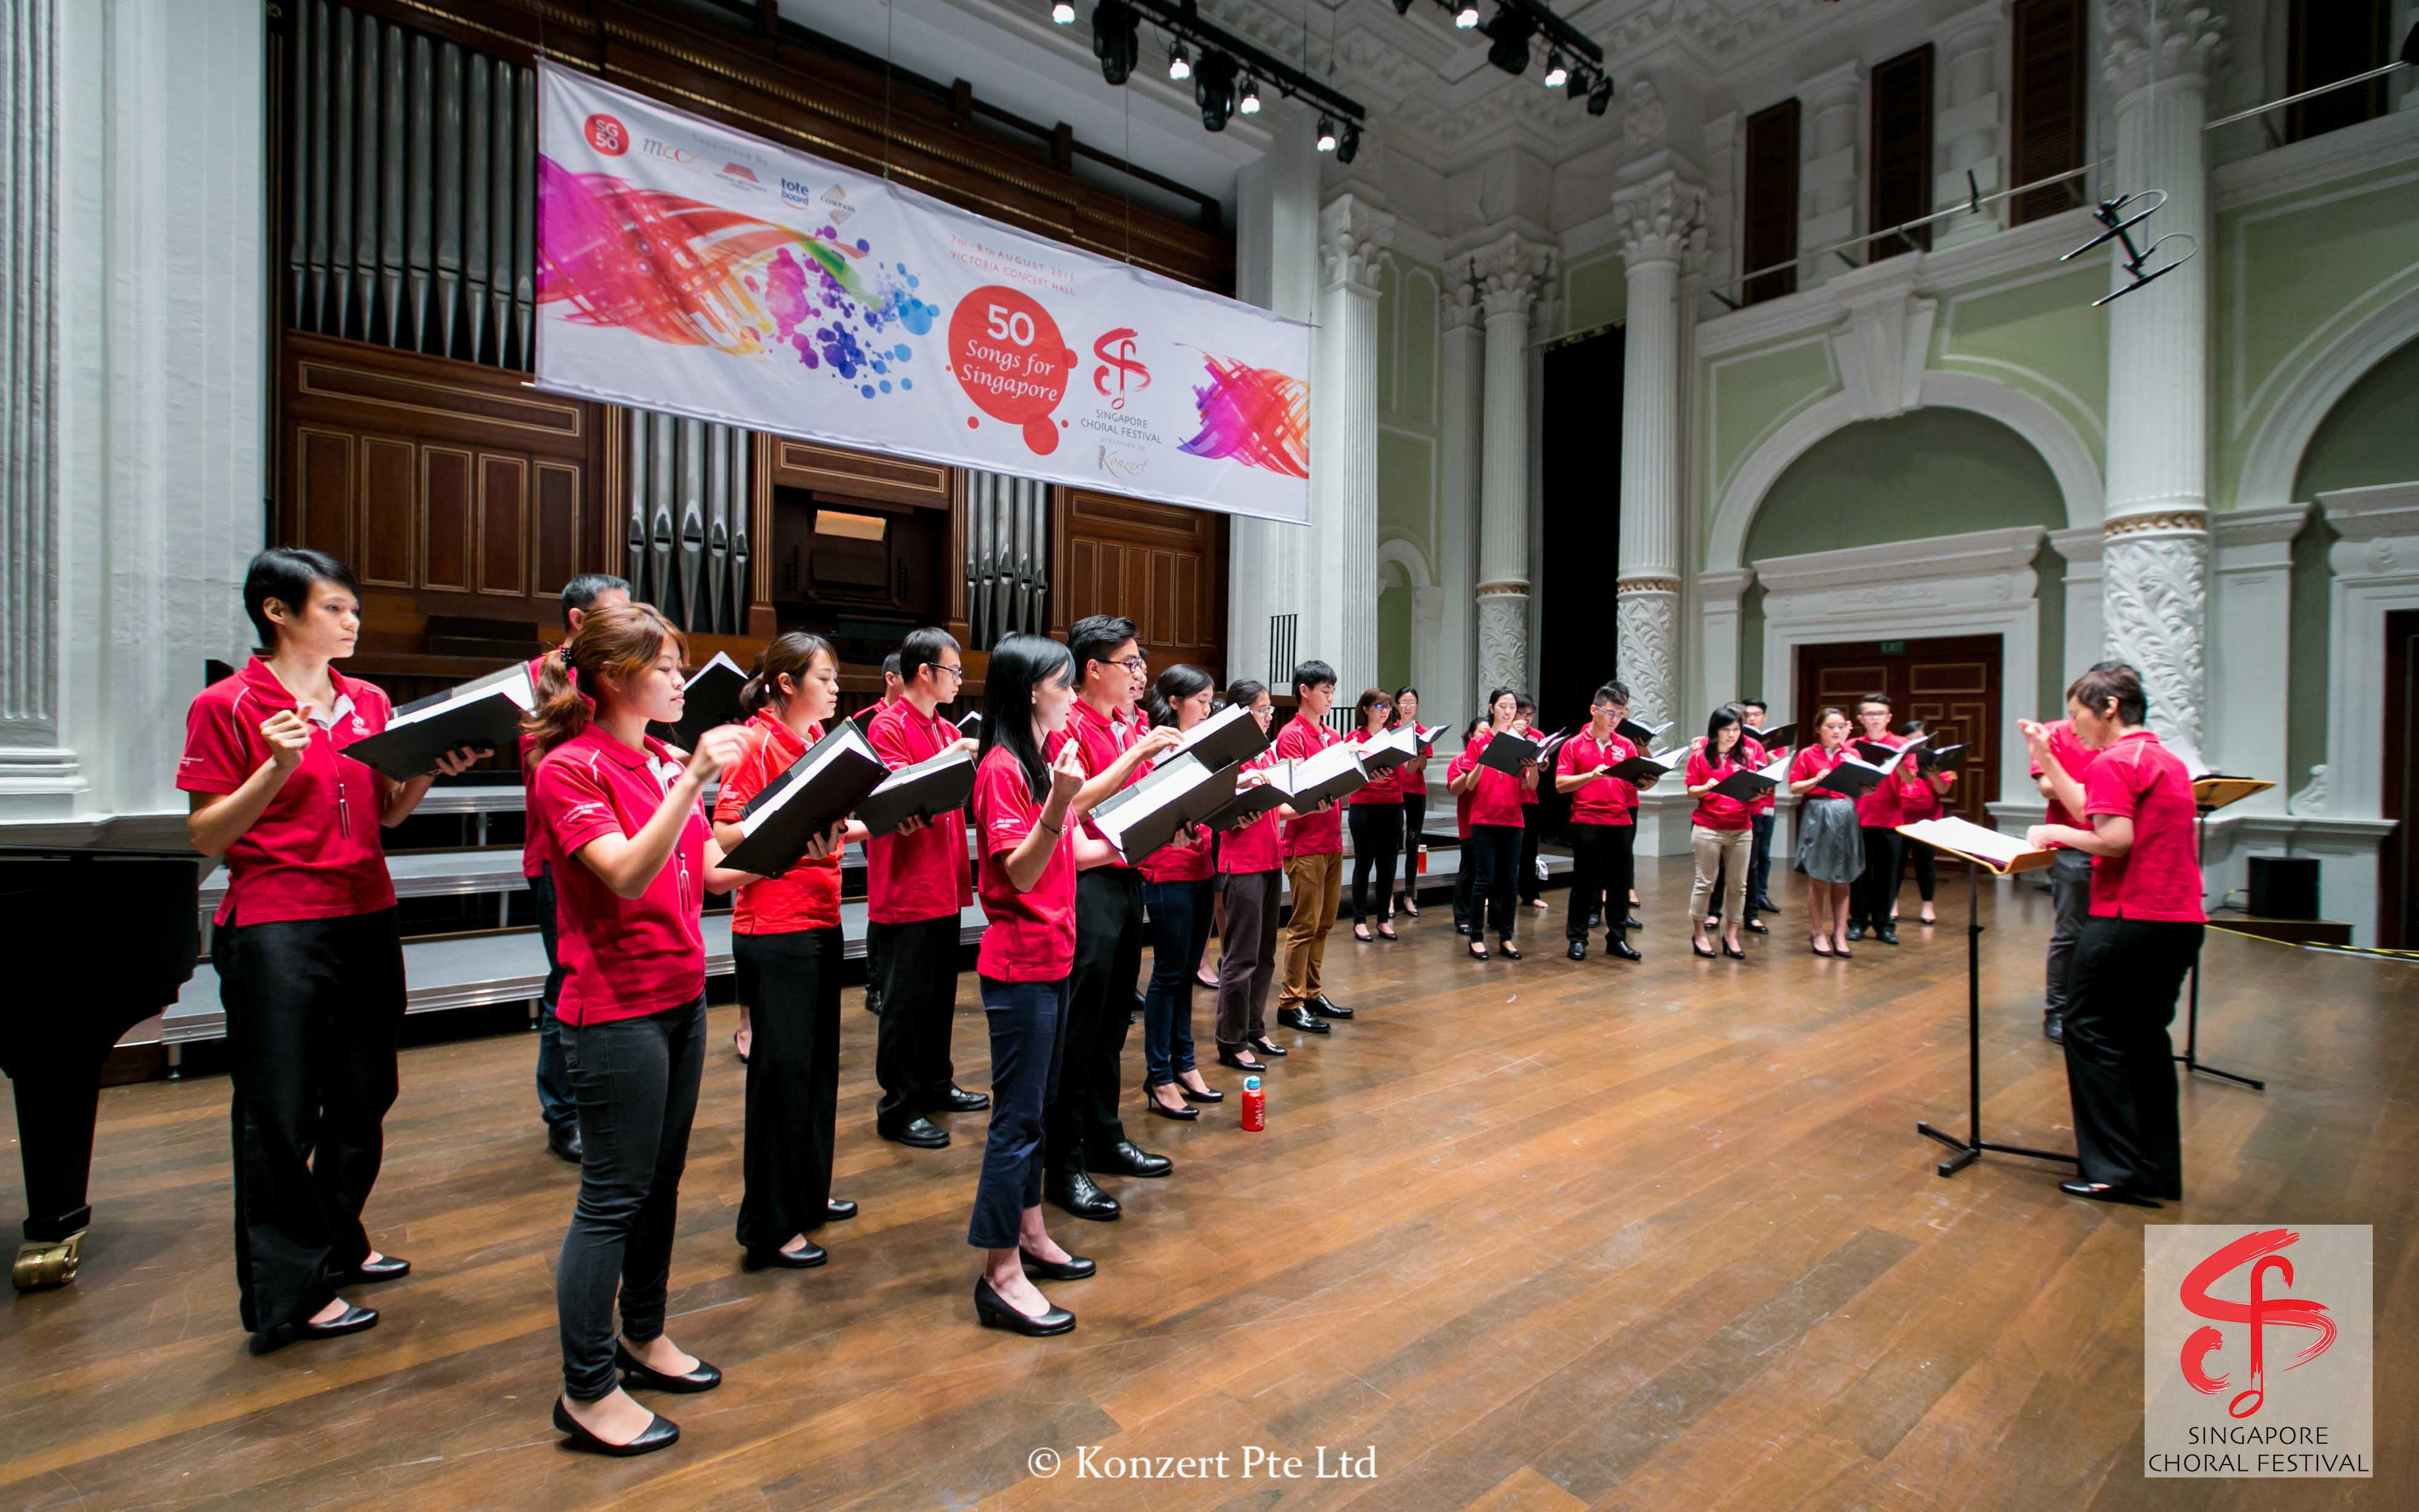 Singapore Choral Festival 8-8-15 (66).jpg